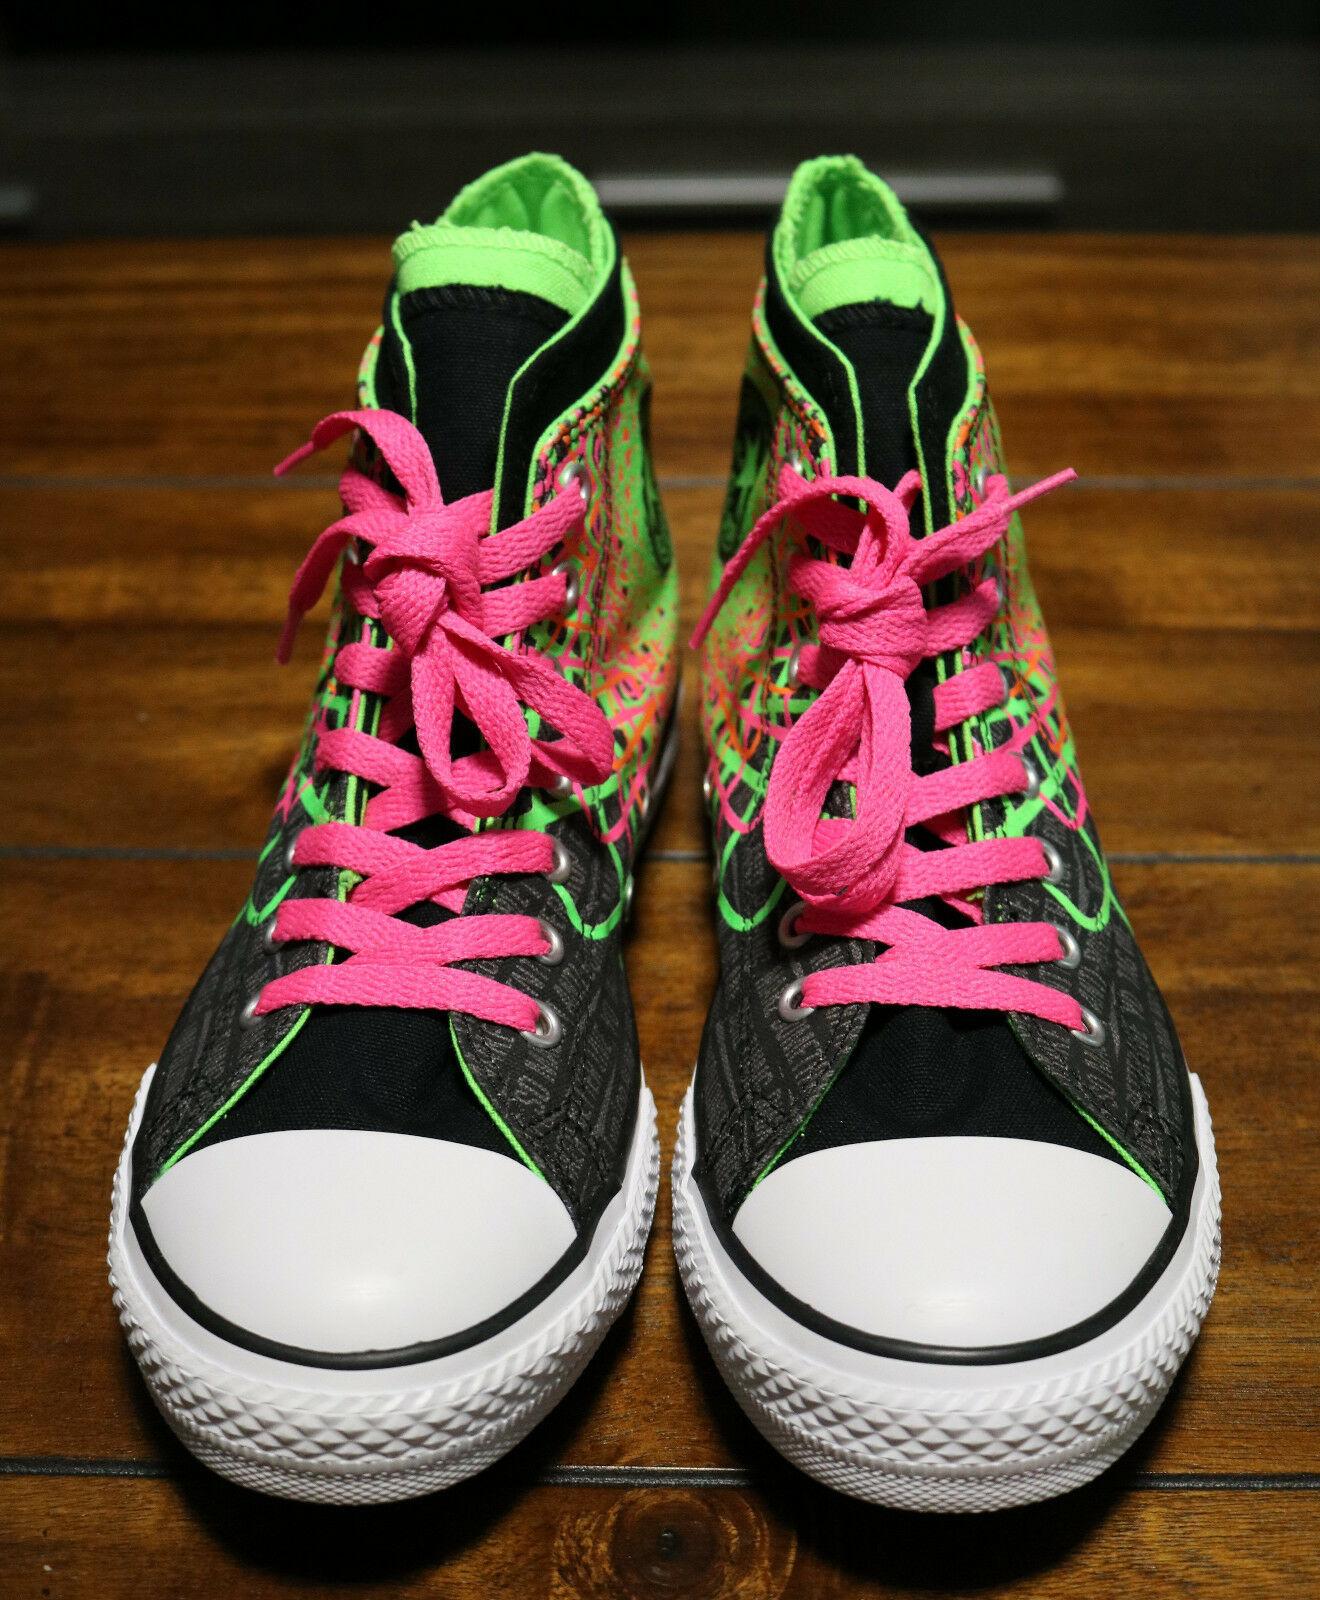 Converse Chuck Taylor All Star Zipback 649963C Black Pink Green Shoes Girls Sz 5 image 4